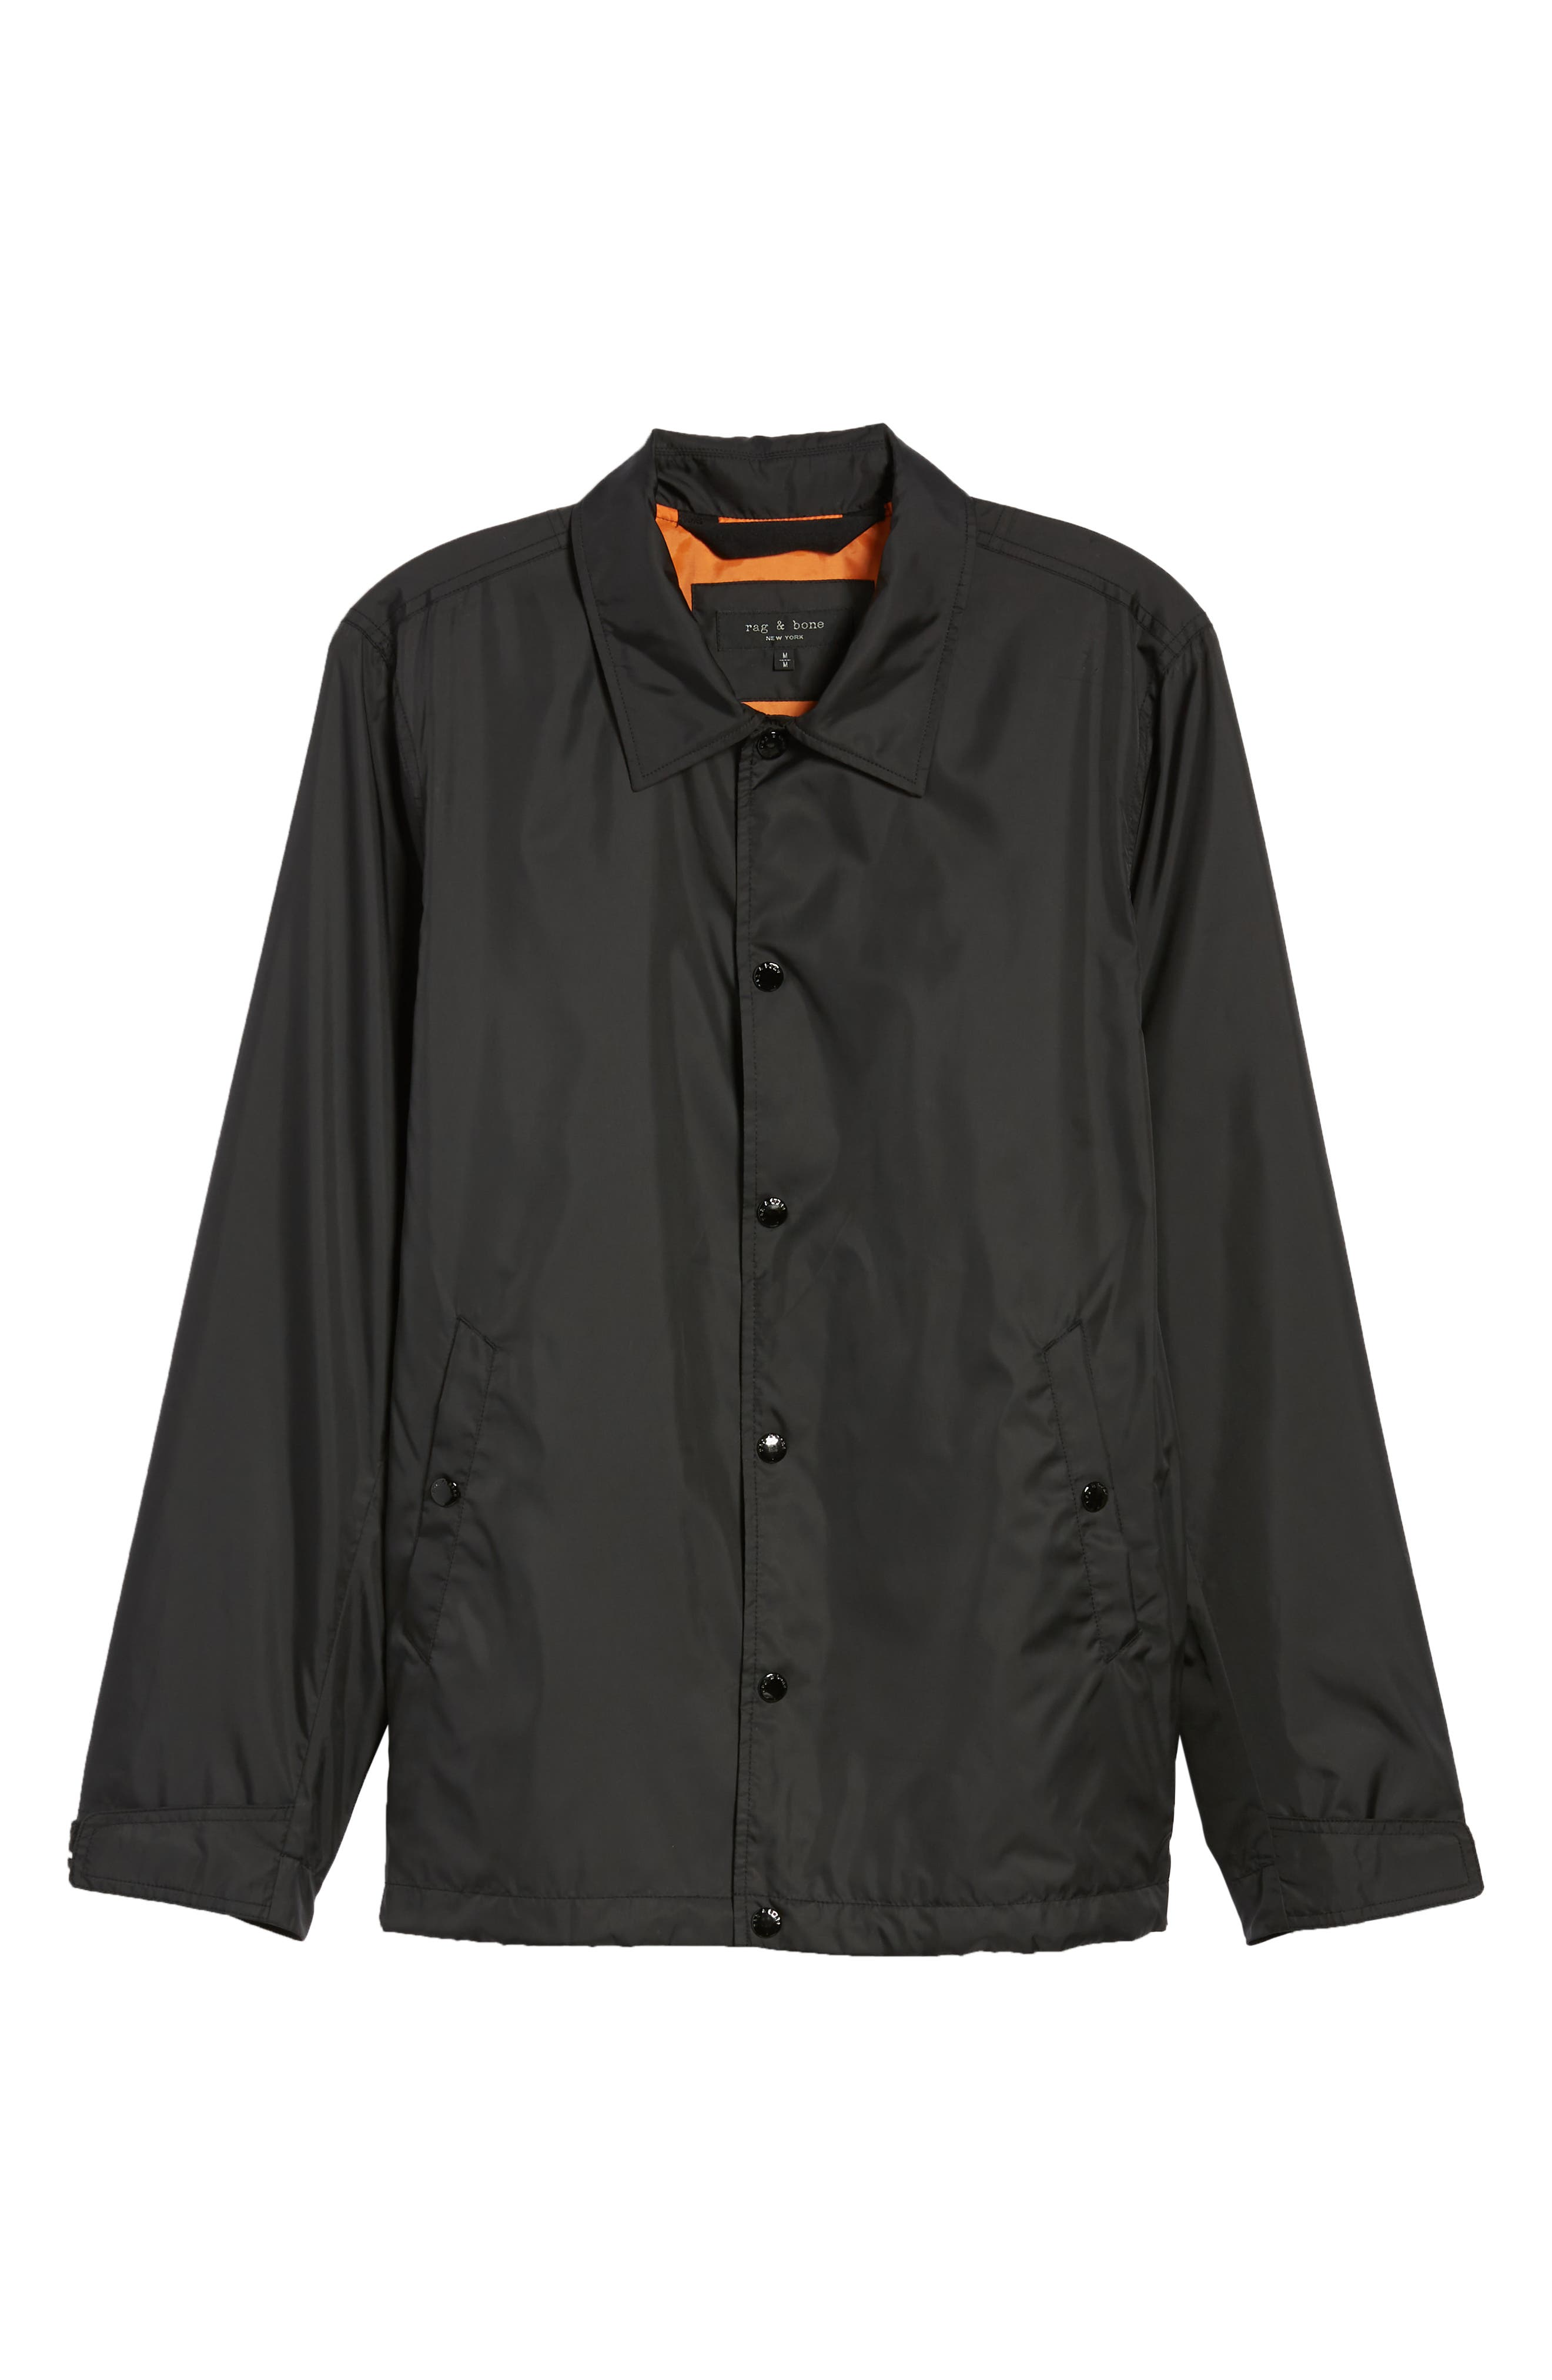 Coaches Jacket,                             Alternate thumbnail 6, color,                             Black